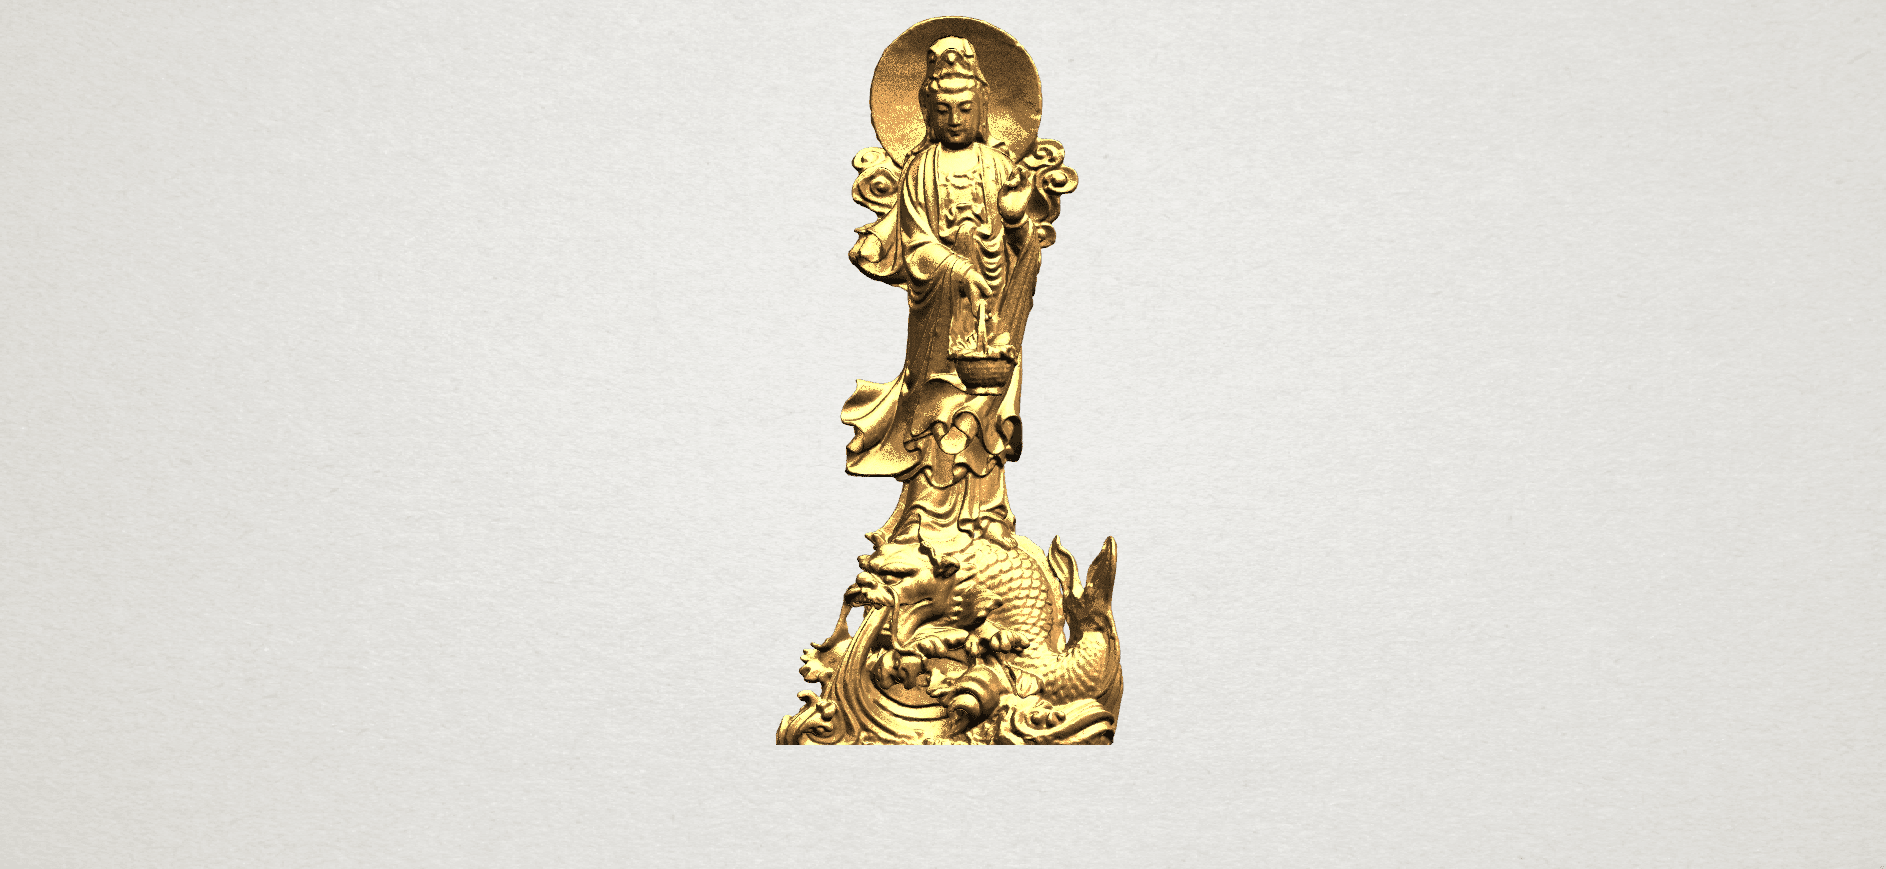 Avalokitesvara Buddha  (with fish) (ii) A01.png Download free STL file Avalokitesvara Bodhisattva (with fish) 02 • 3D printer template, GeorgesNikkei